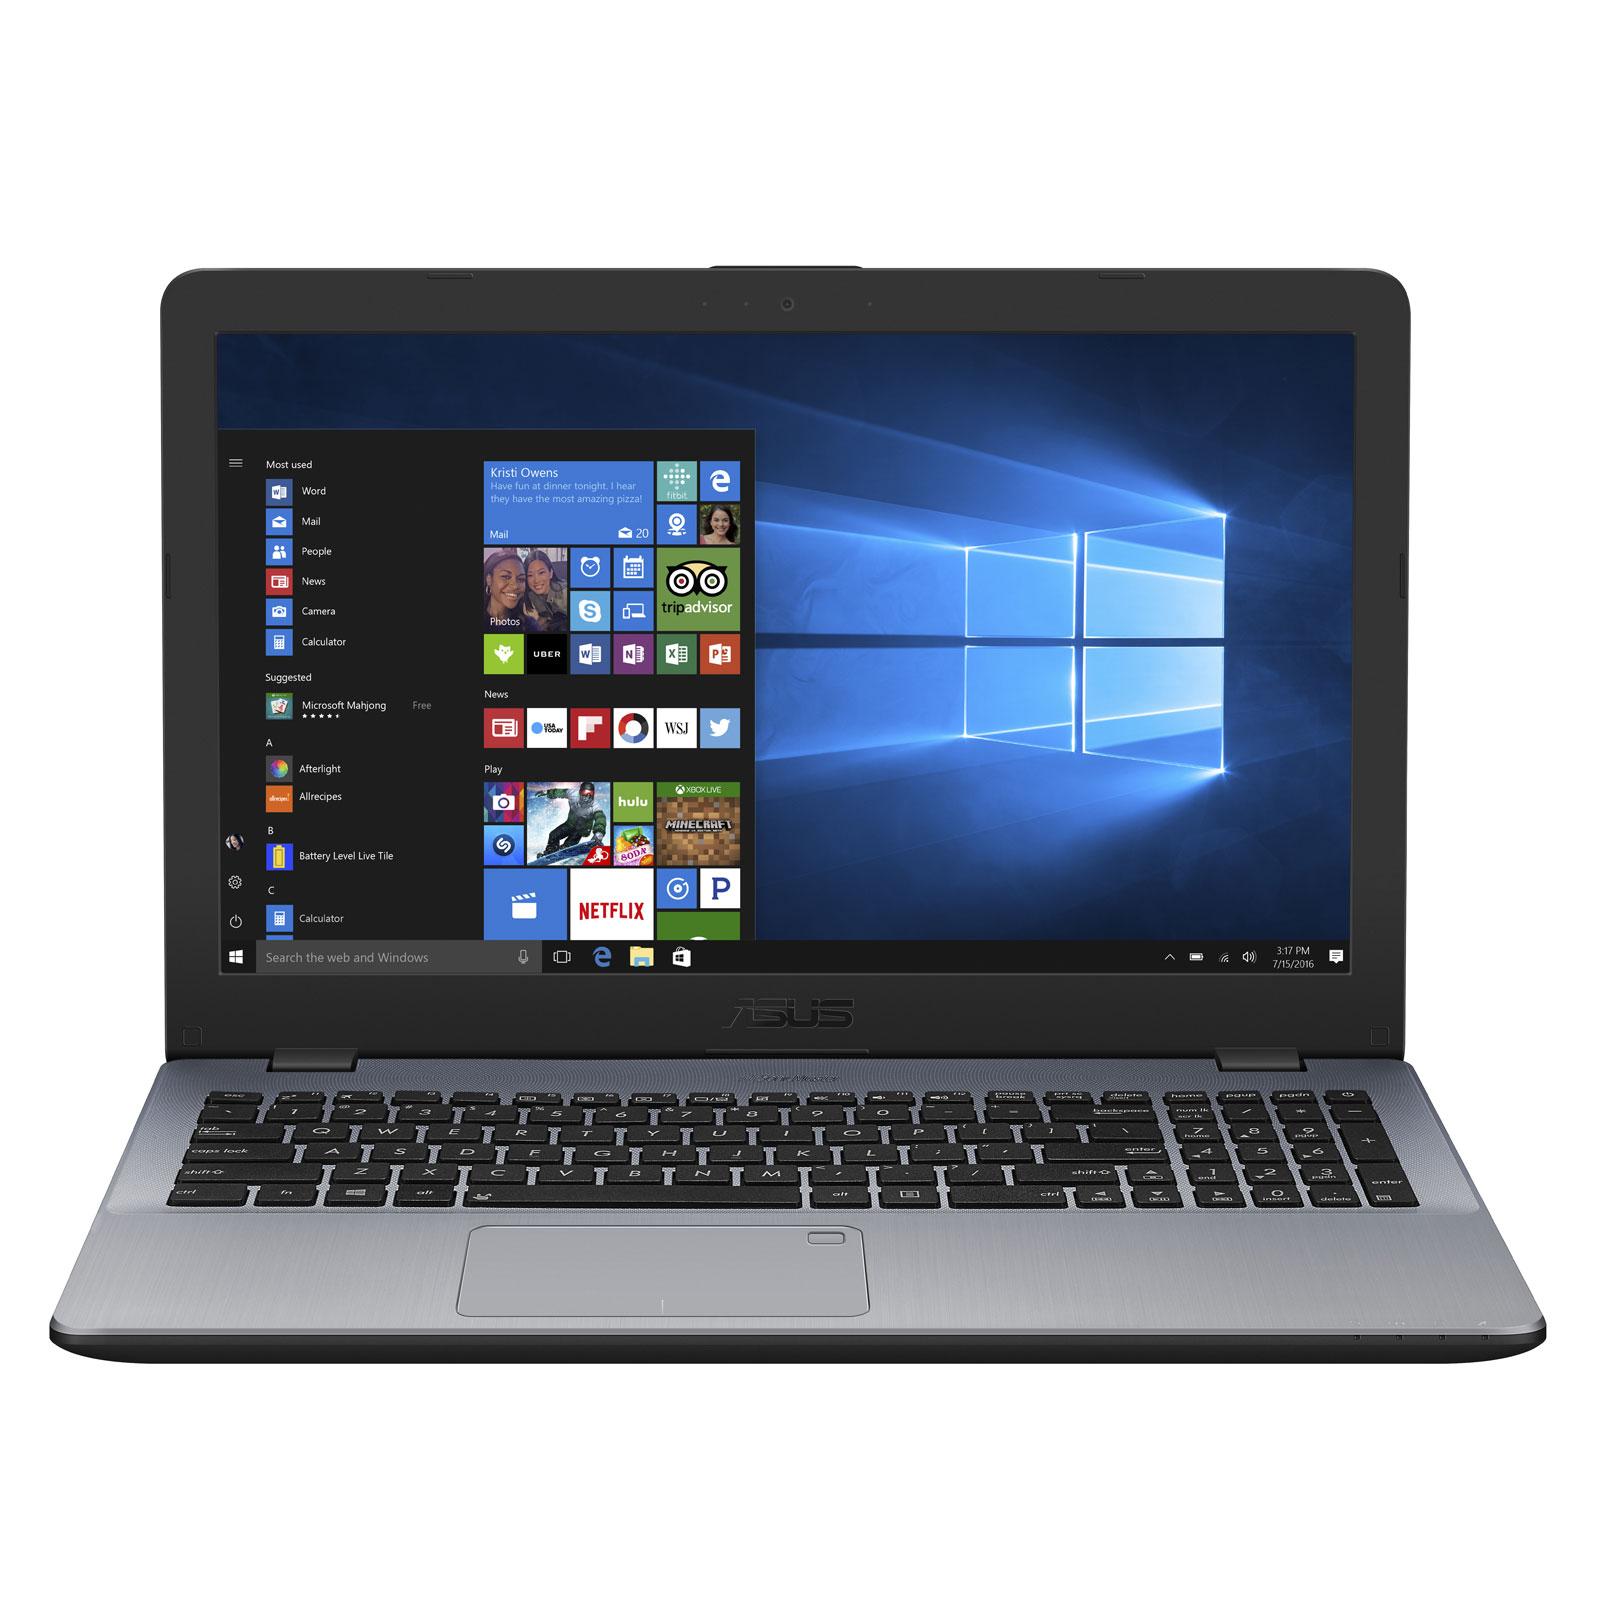 ASUS P15 P1501UA-GQ502R (90NB0F22-M06620) - Achat / Vente PC portable sur Picata.fr - 0